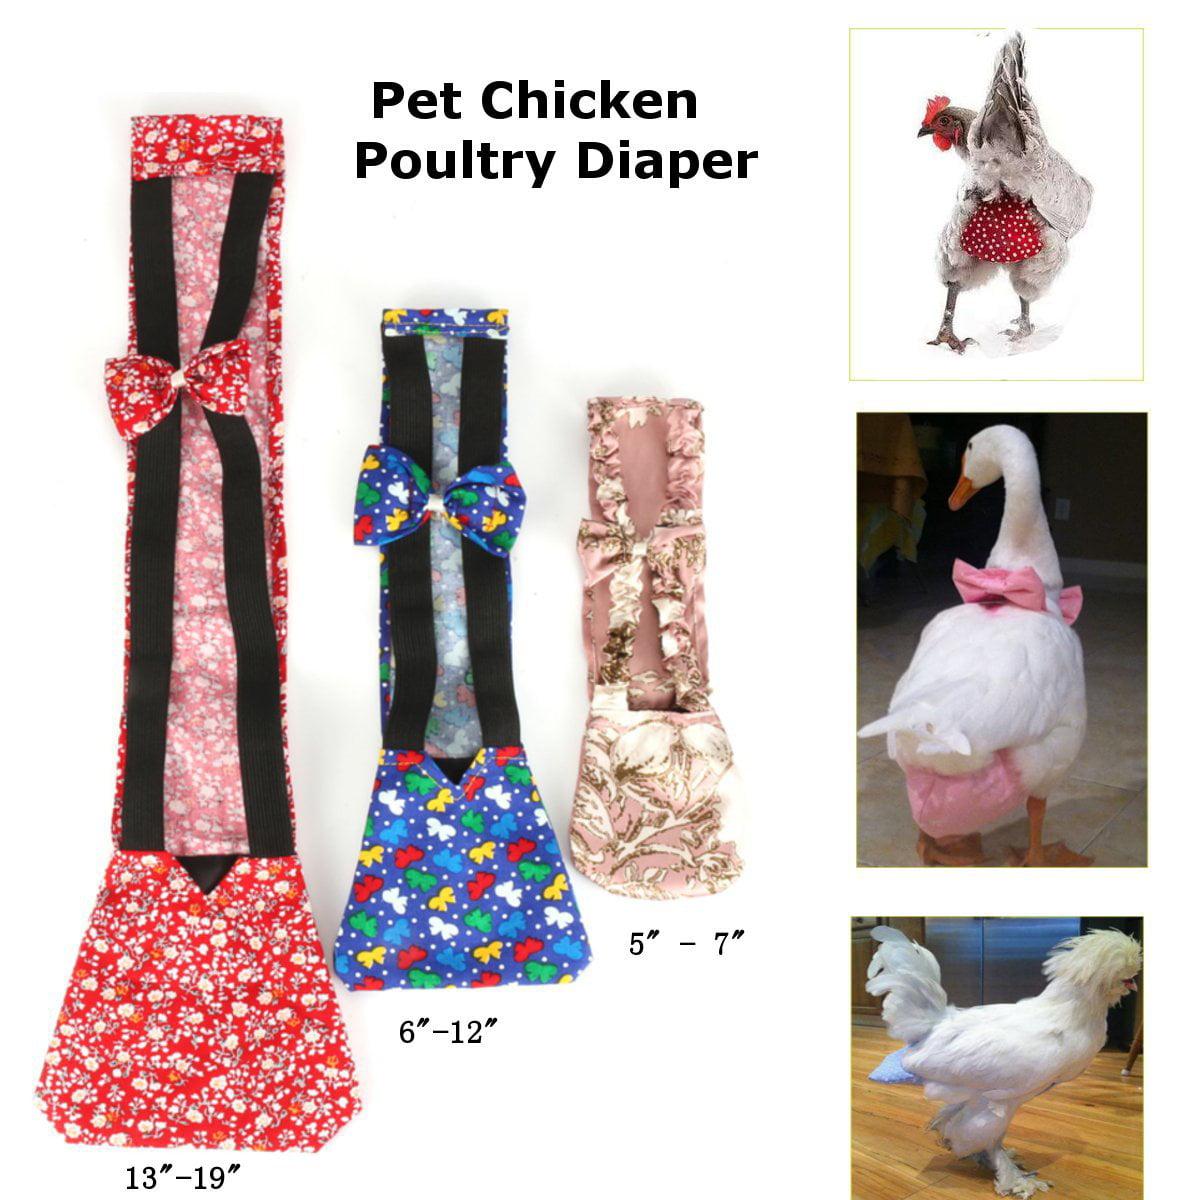 1Pc 3 Sizes Small/Medium/XL Goose Duck Chicken Poultry Cloth Diaper Pet Adjustable Farm